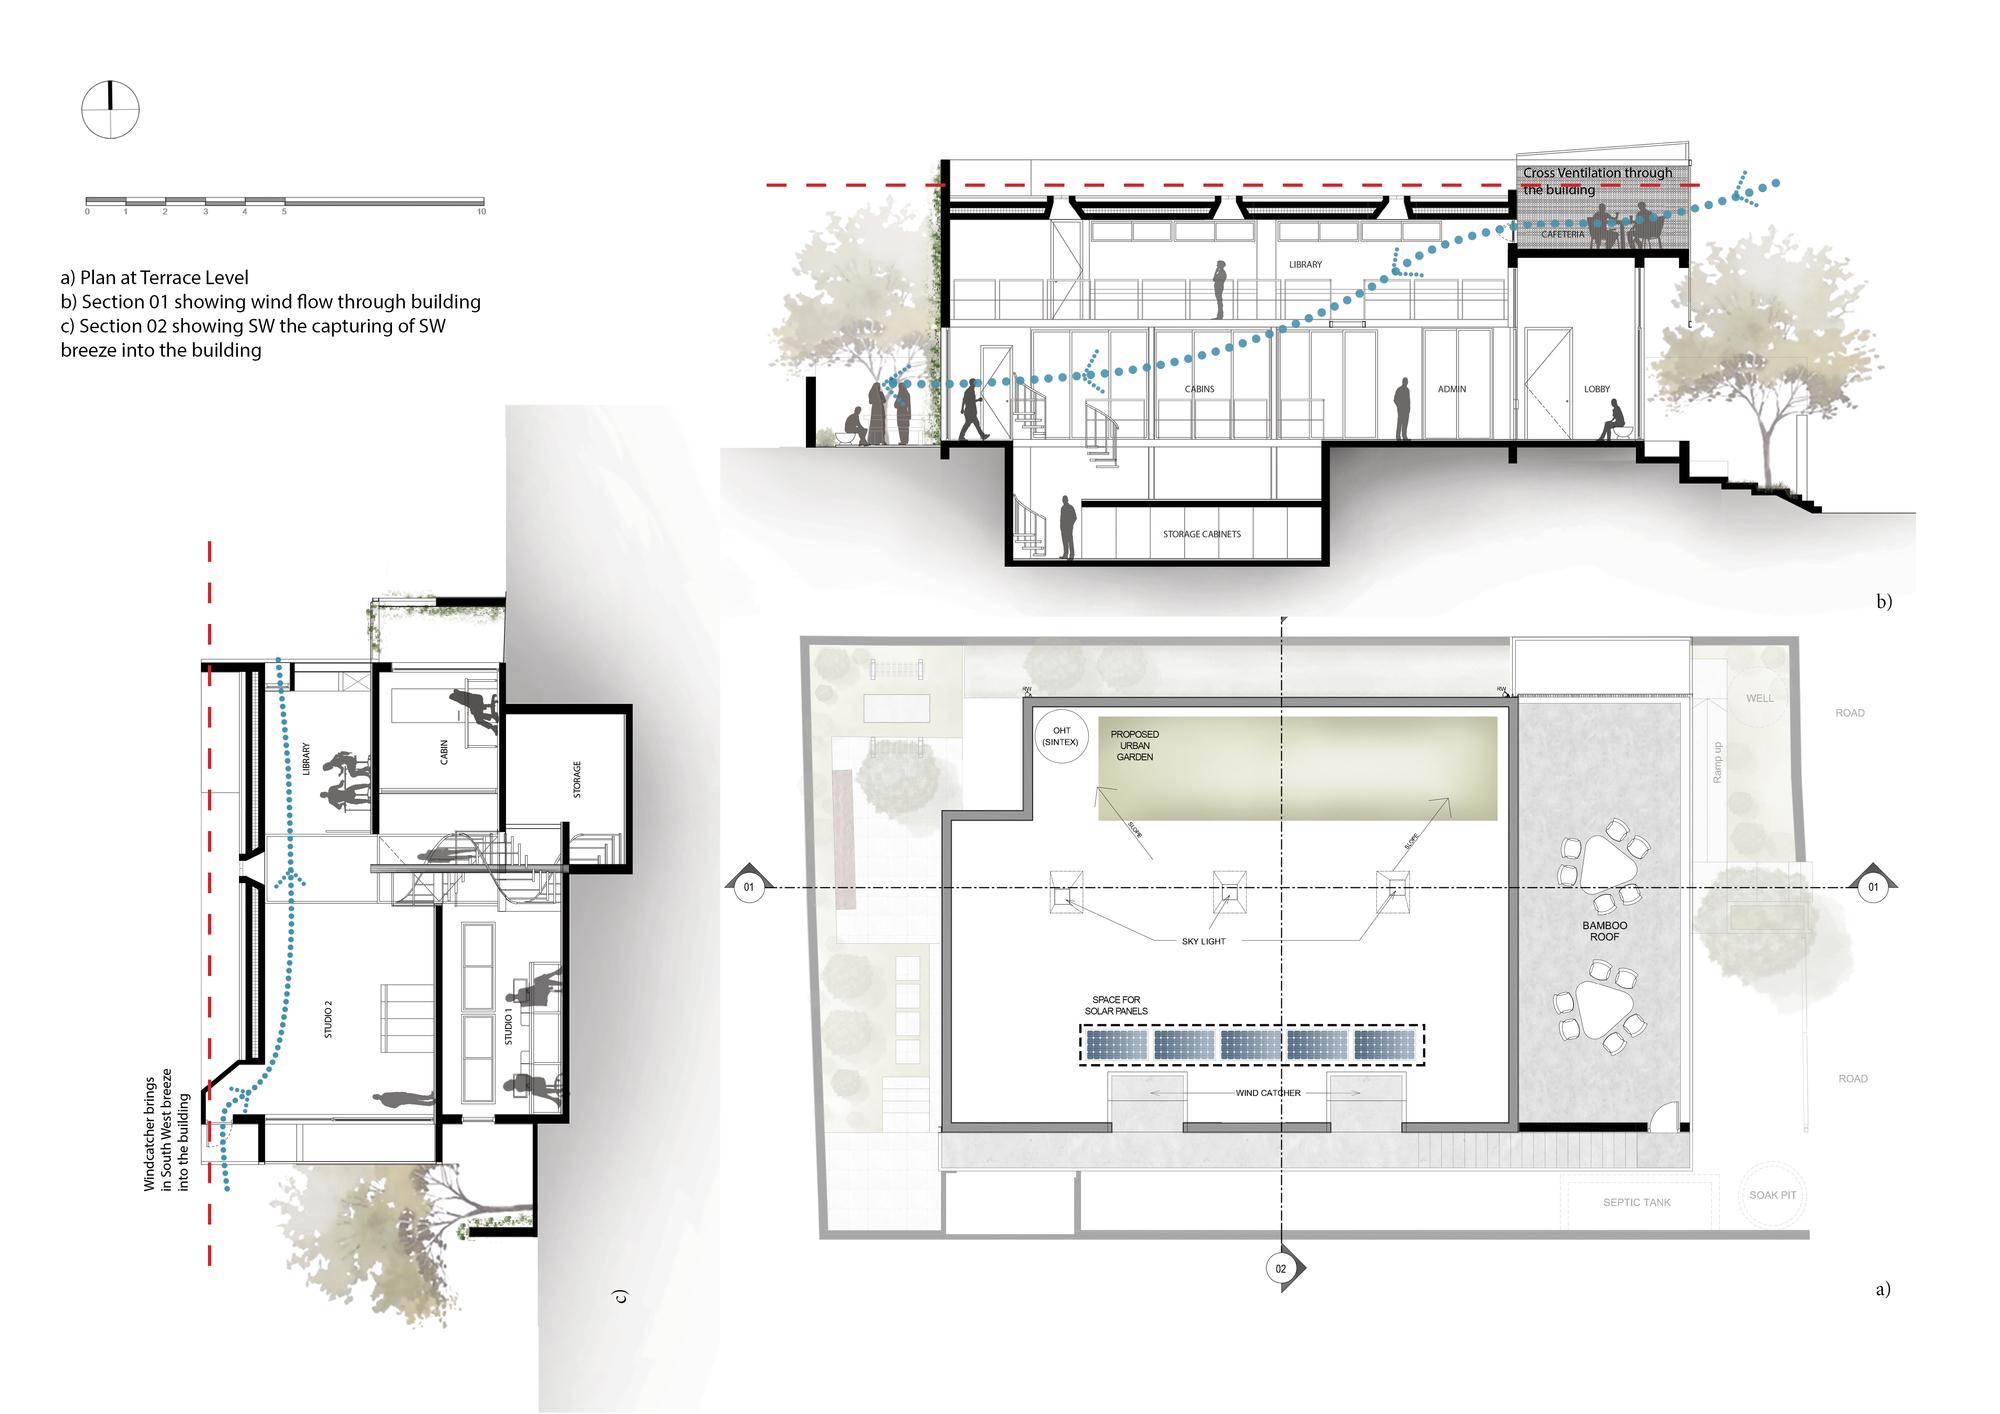 gallery of ksm architecture studio ksm architecture 33 zoom image view original size